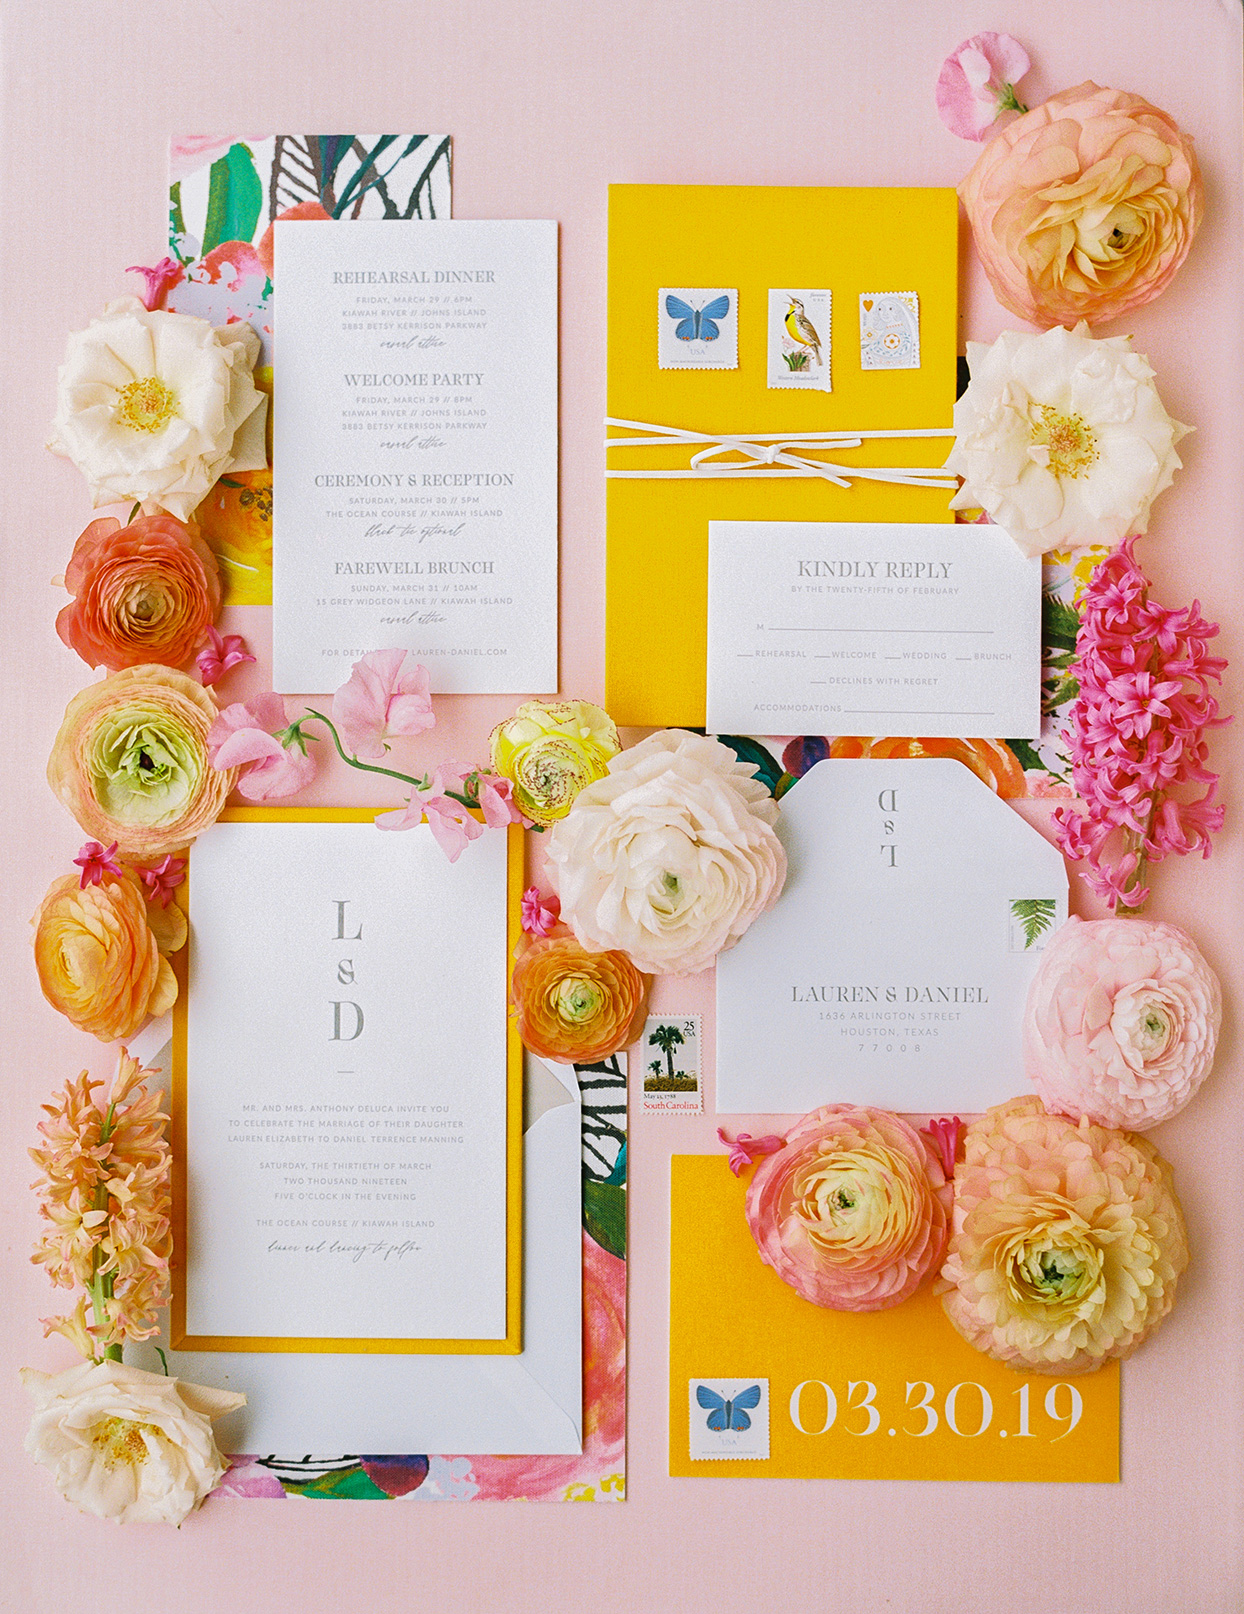 lauren dan colorful wedding invitation suite orange yellow and pink